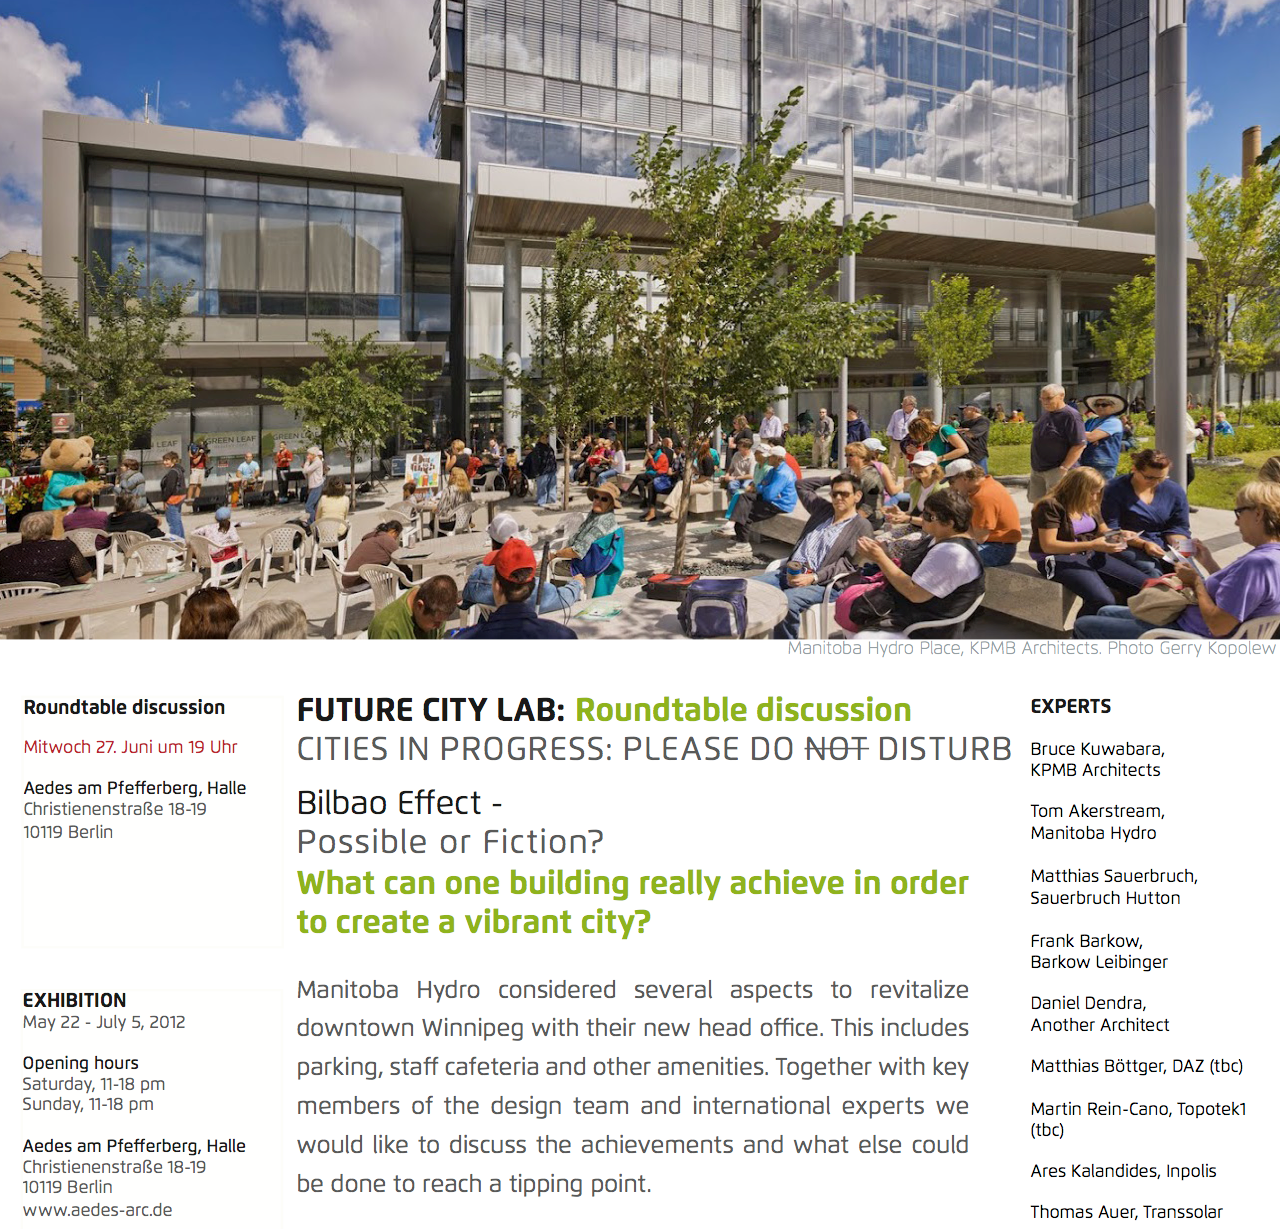 FutureCityLab roundtable: Bilbao effect utopia